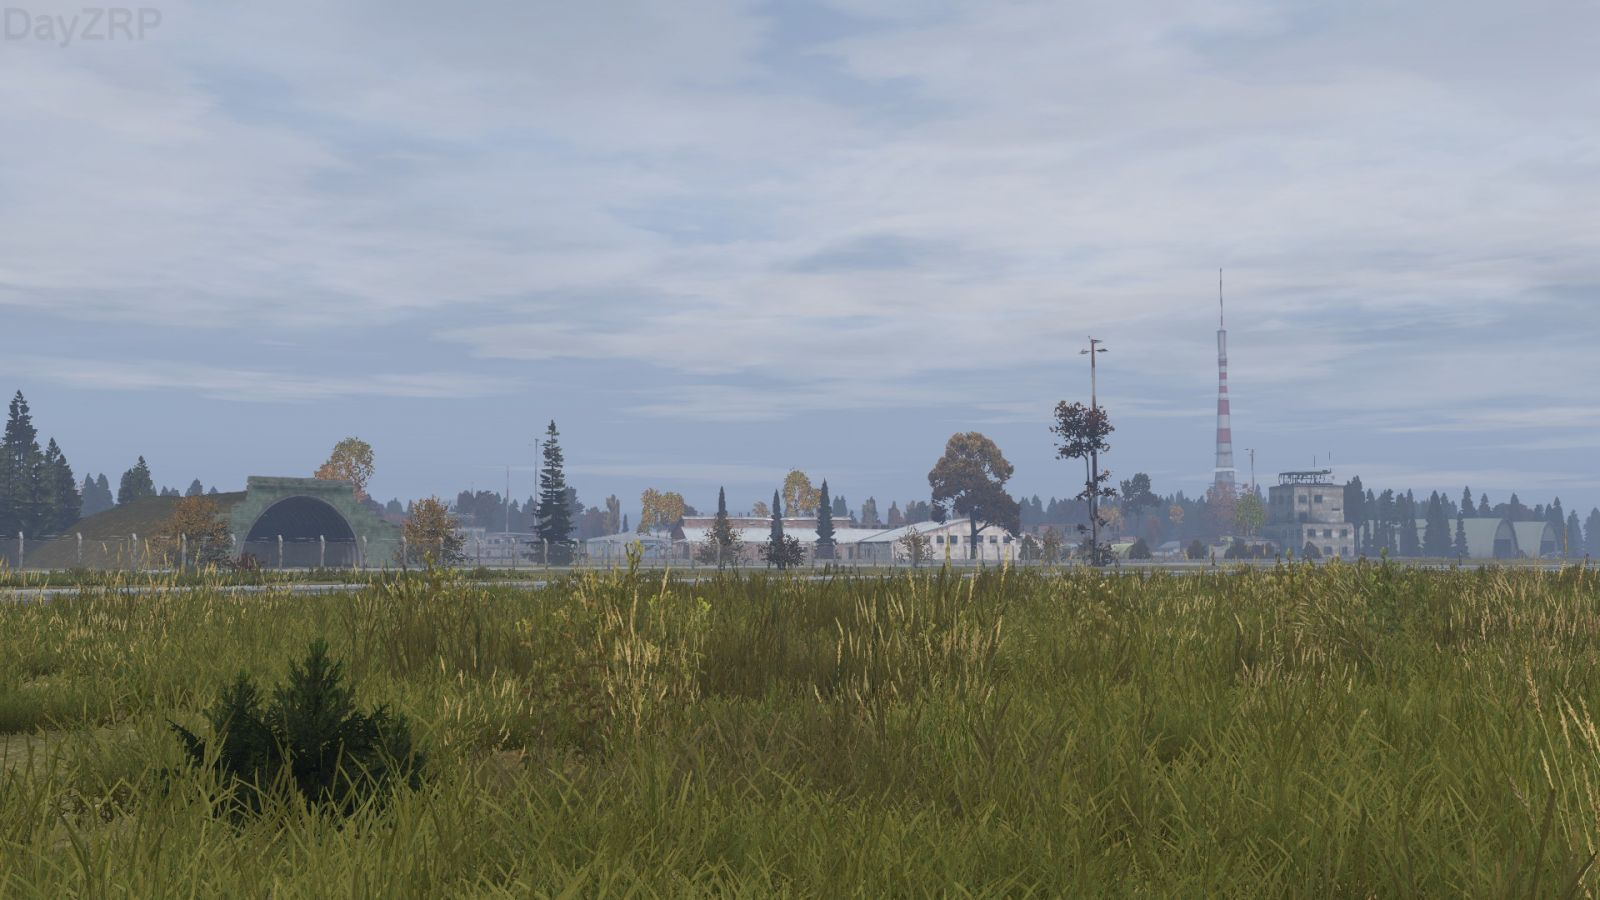 Airfield shot